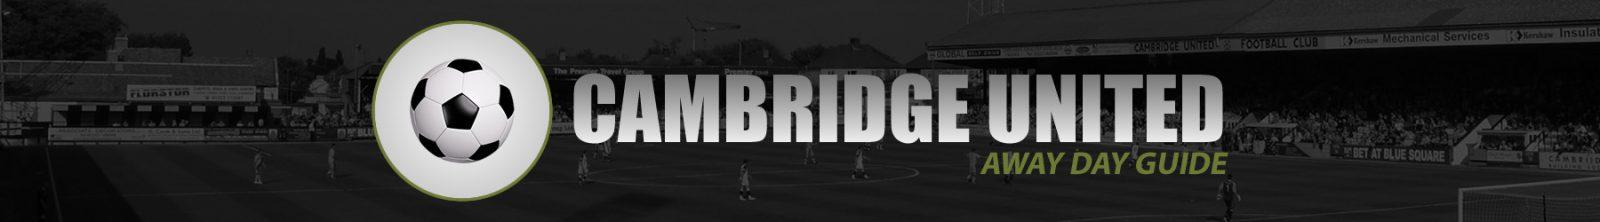 Cambridge United Away